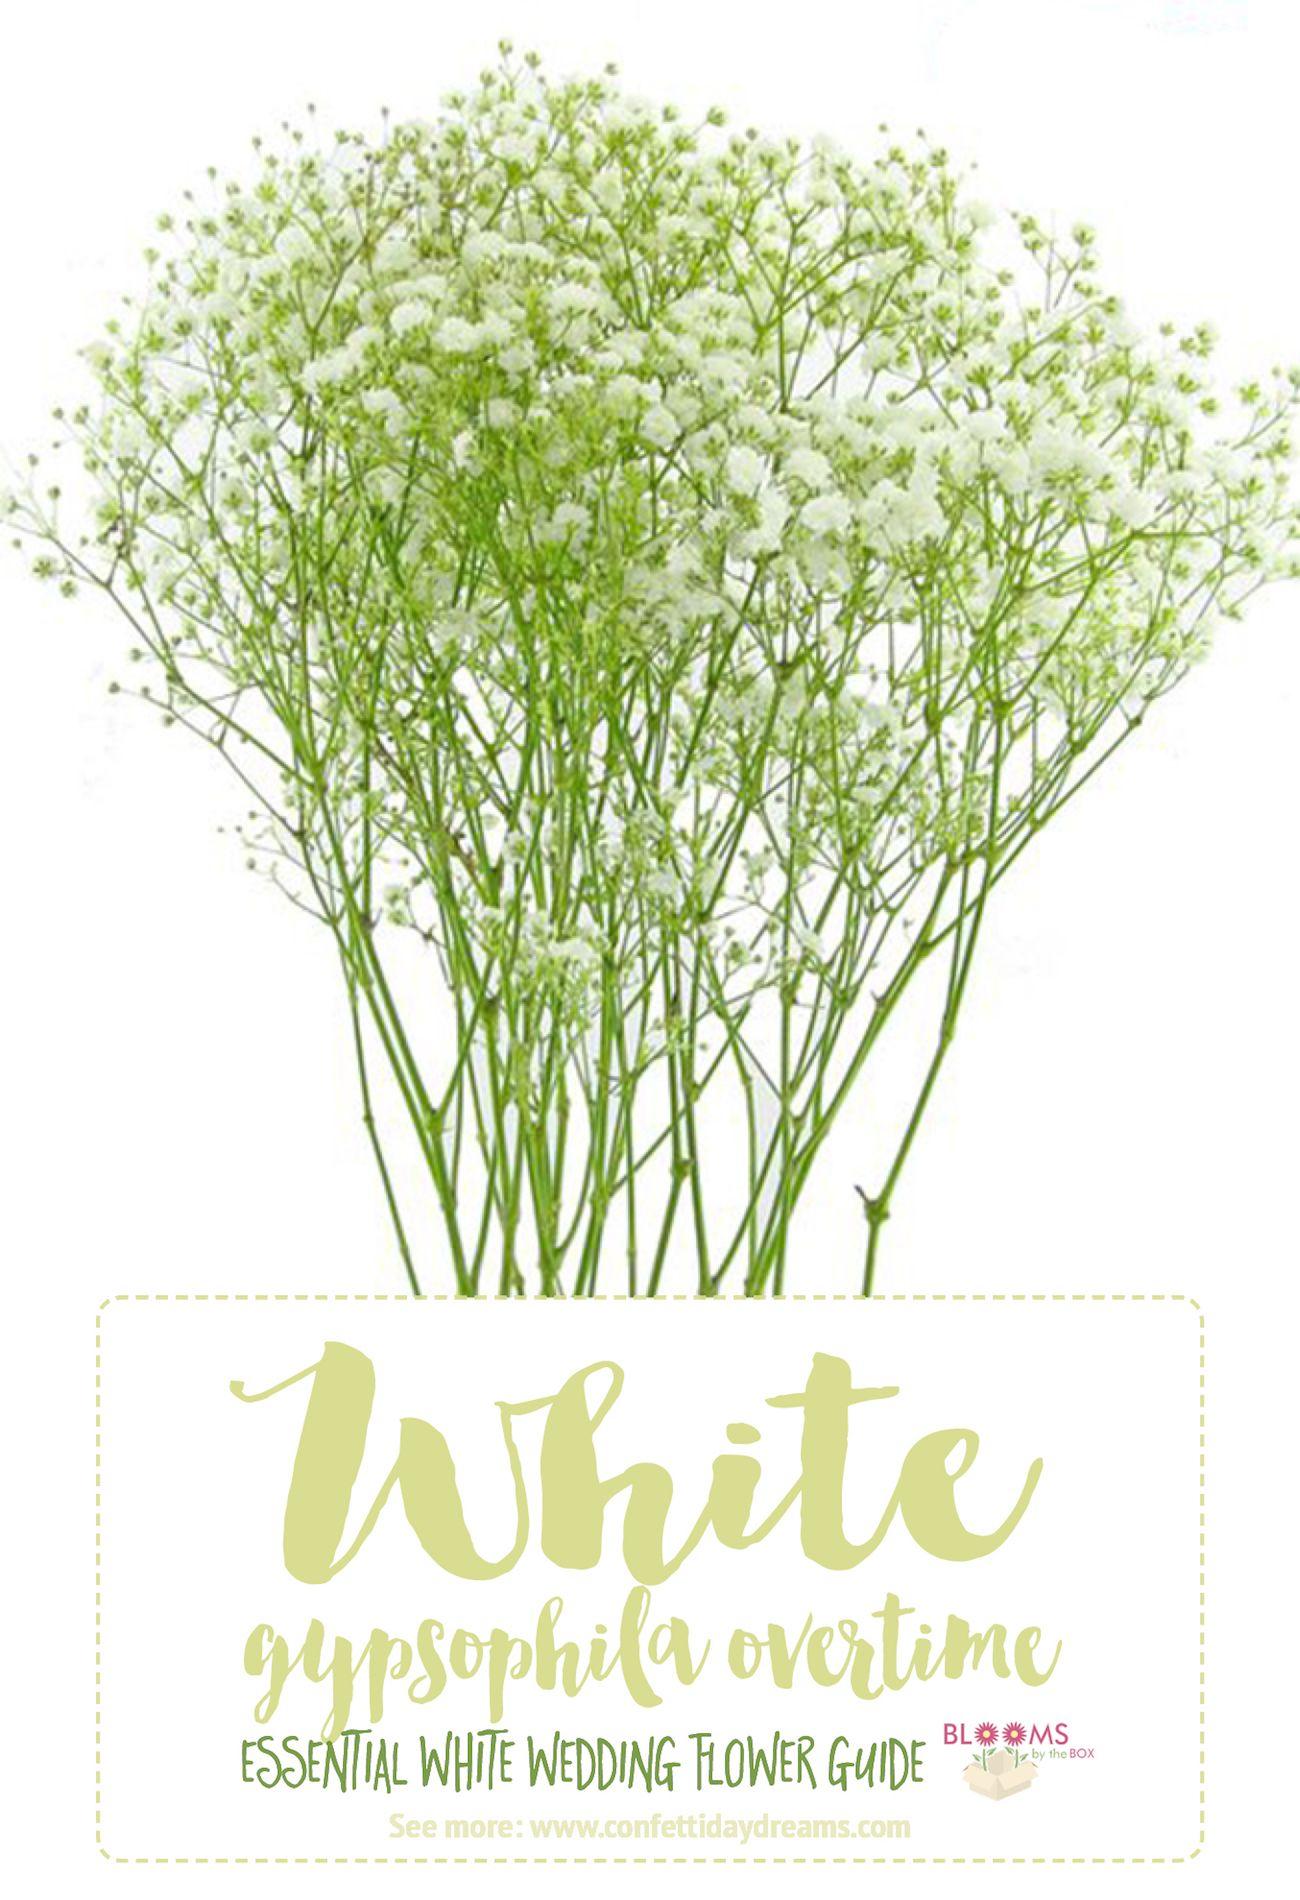 Essential White Wedding Flower Guide Names Types Pics Mmlin